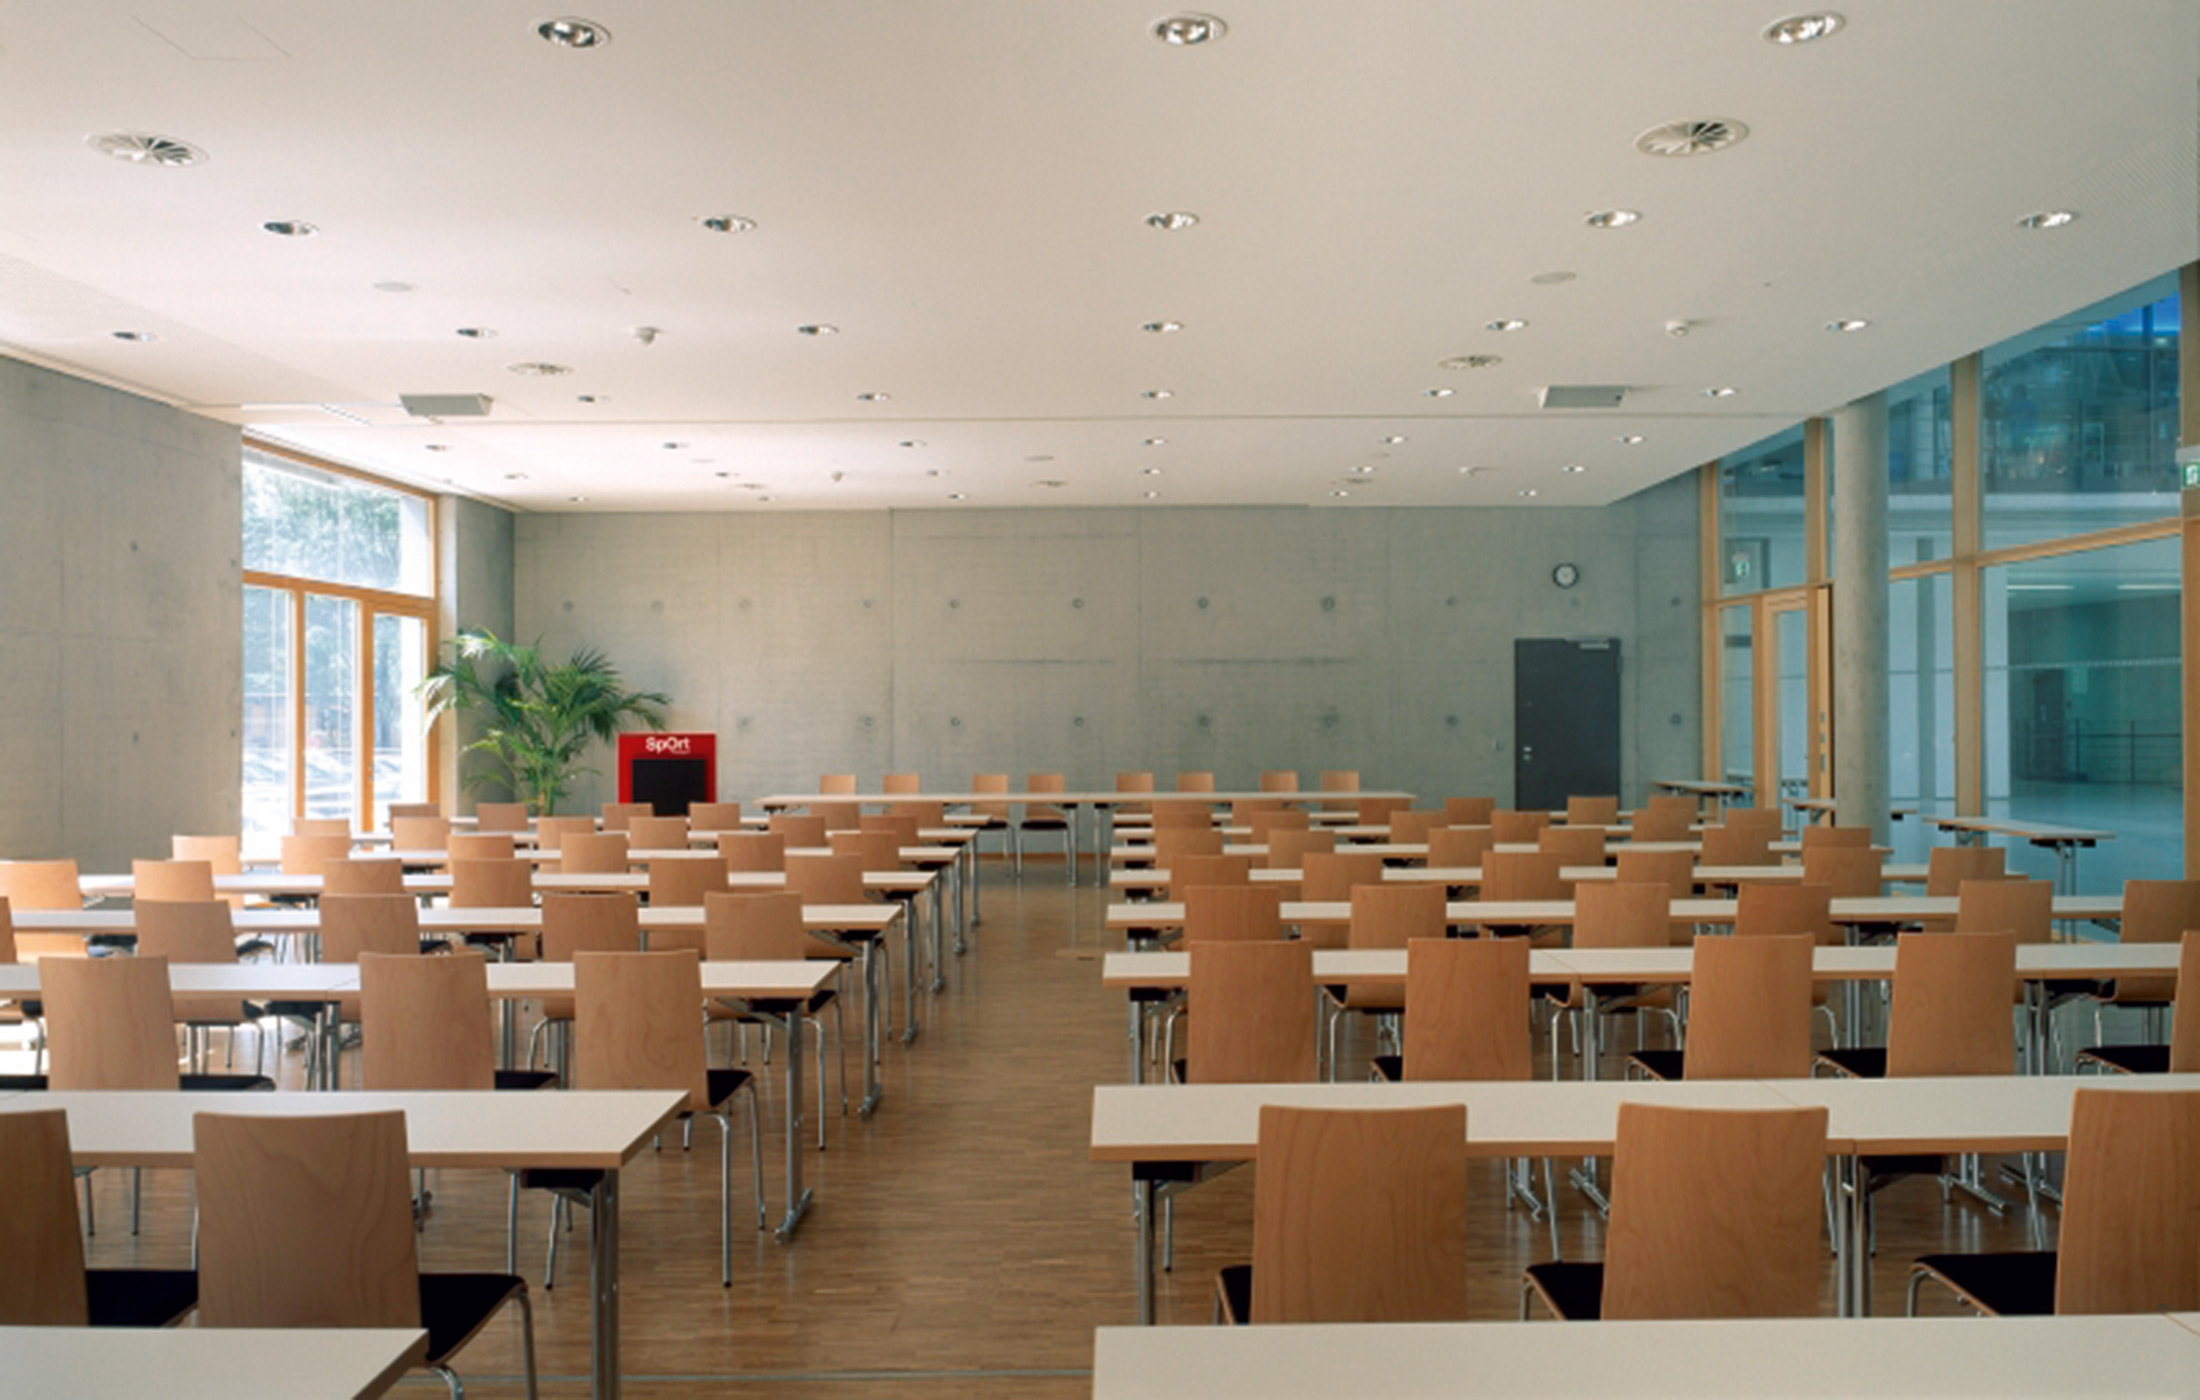 2006, Neubau SpOrt, Stuttgart